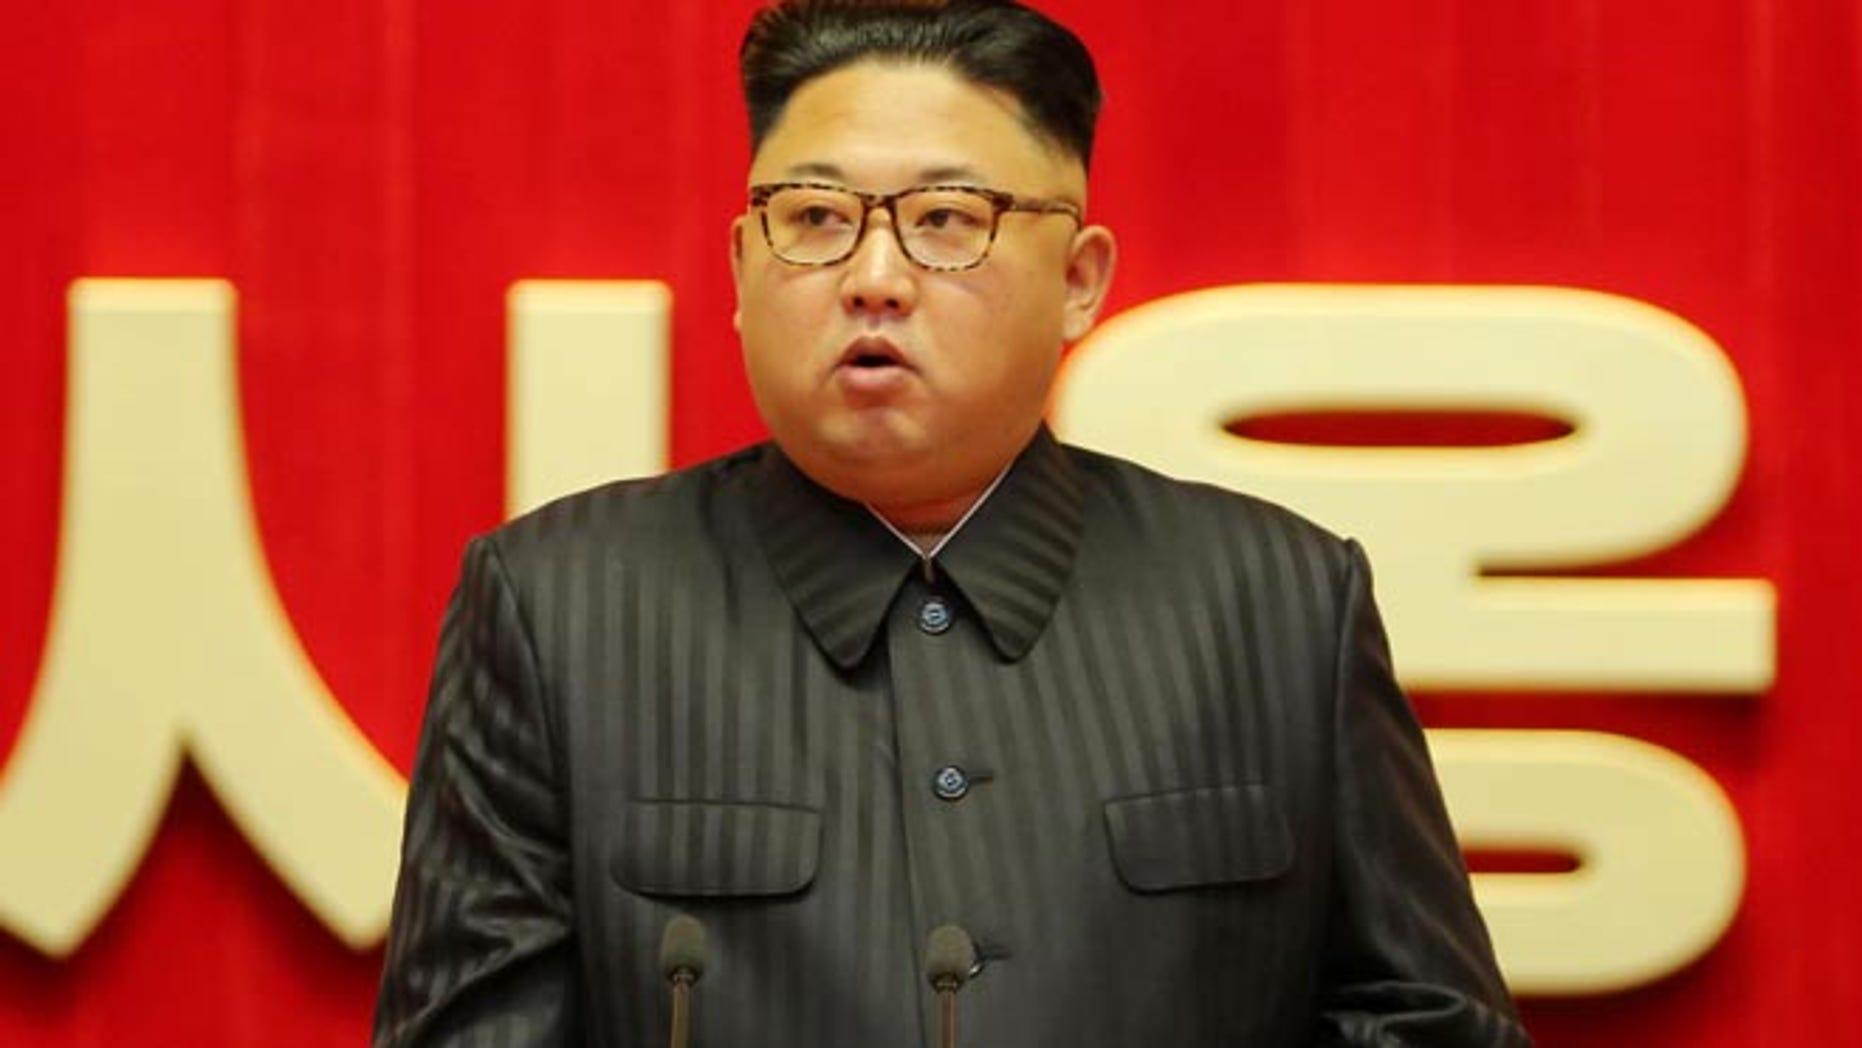 North Korean leader Kim Jong-un in August. (Reuters)